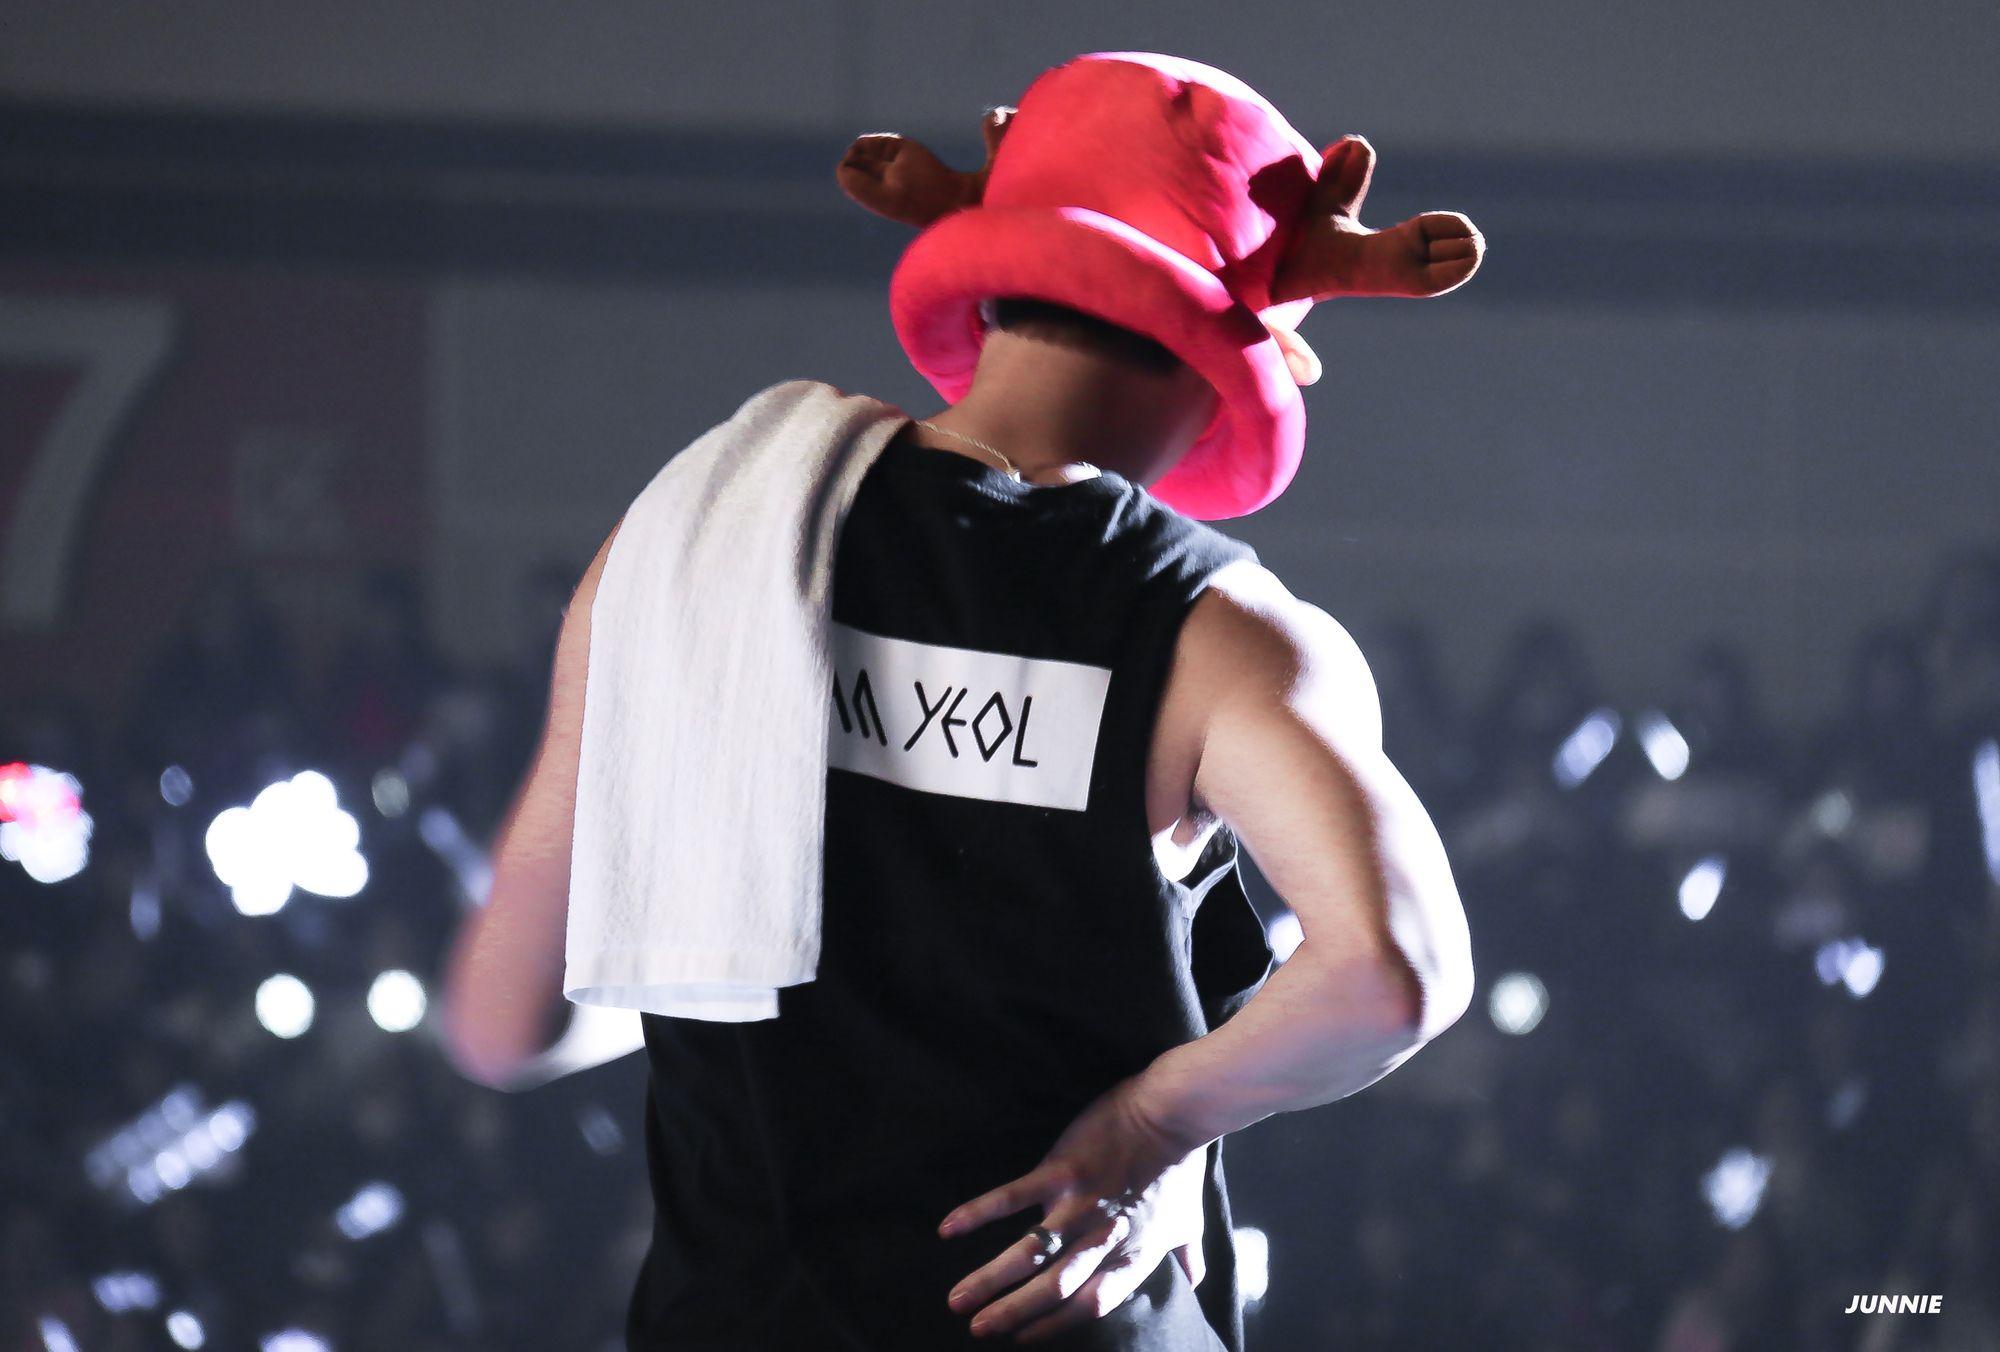 151212 EXO Chanyeol (cr: JUNNIE)